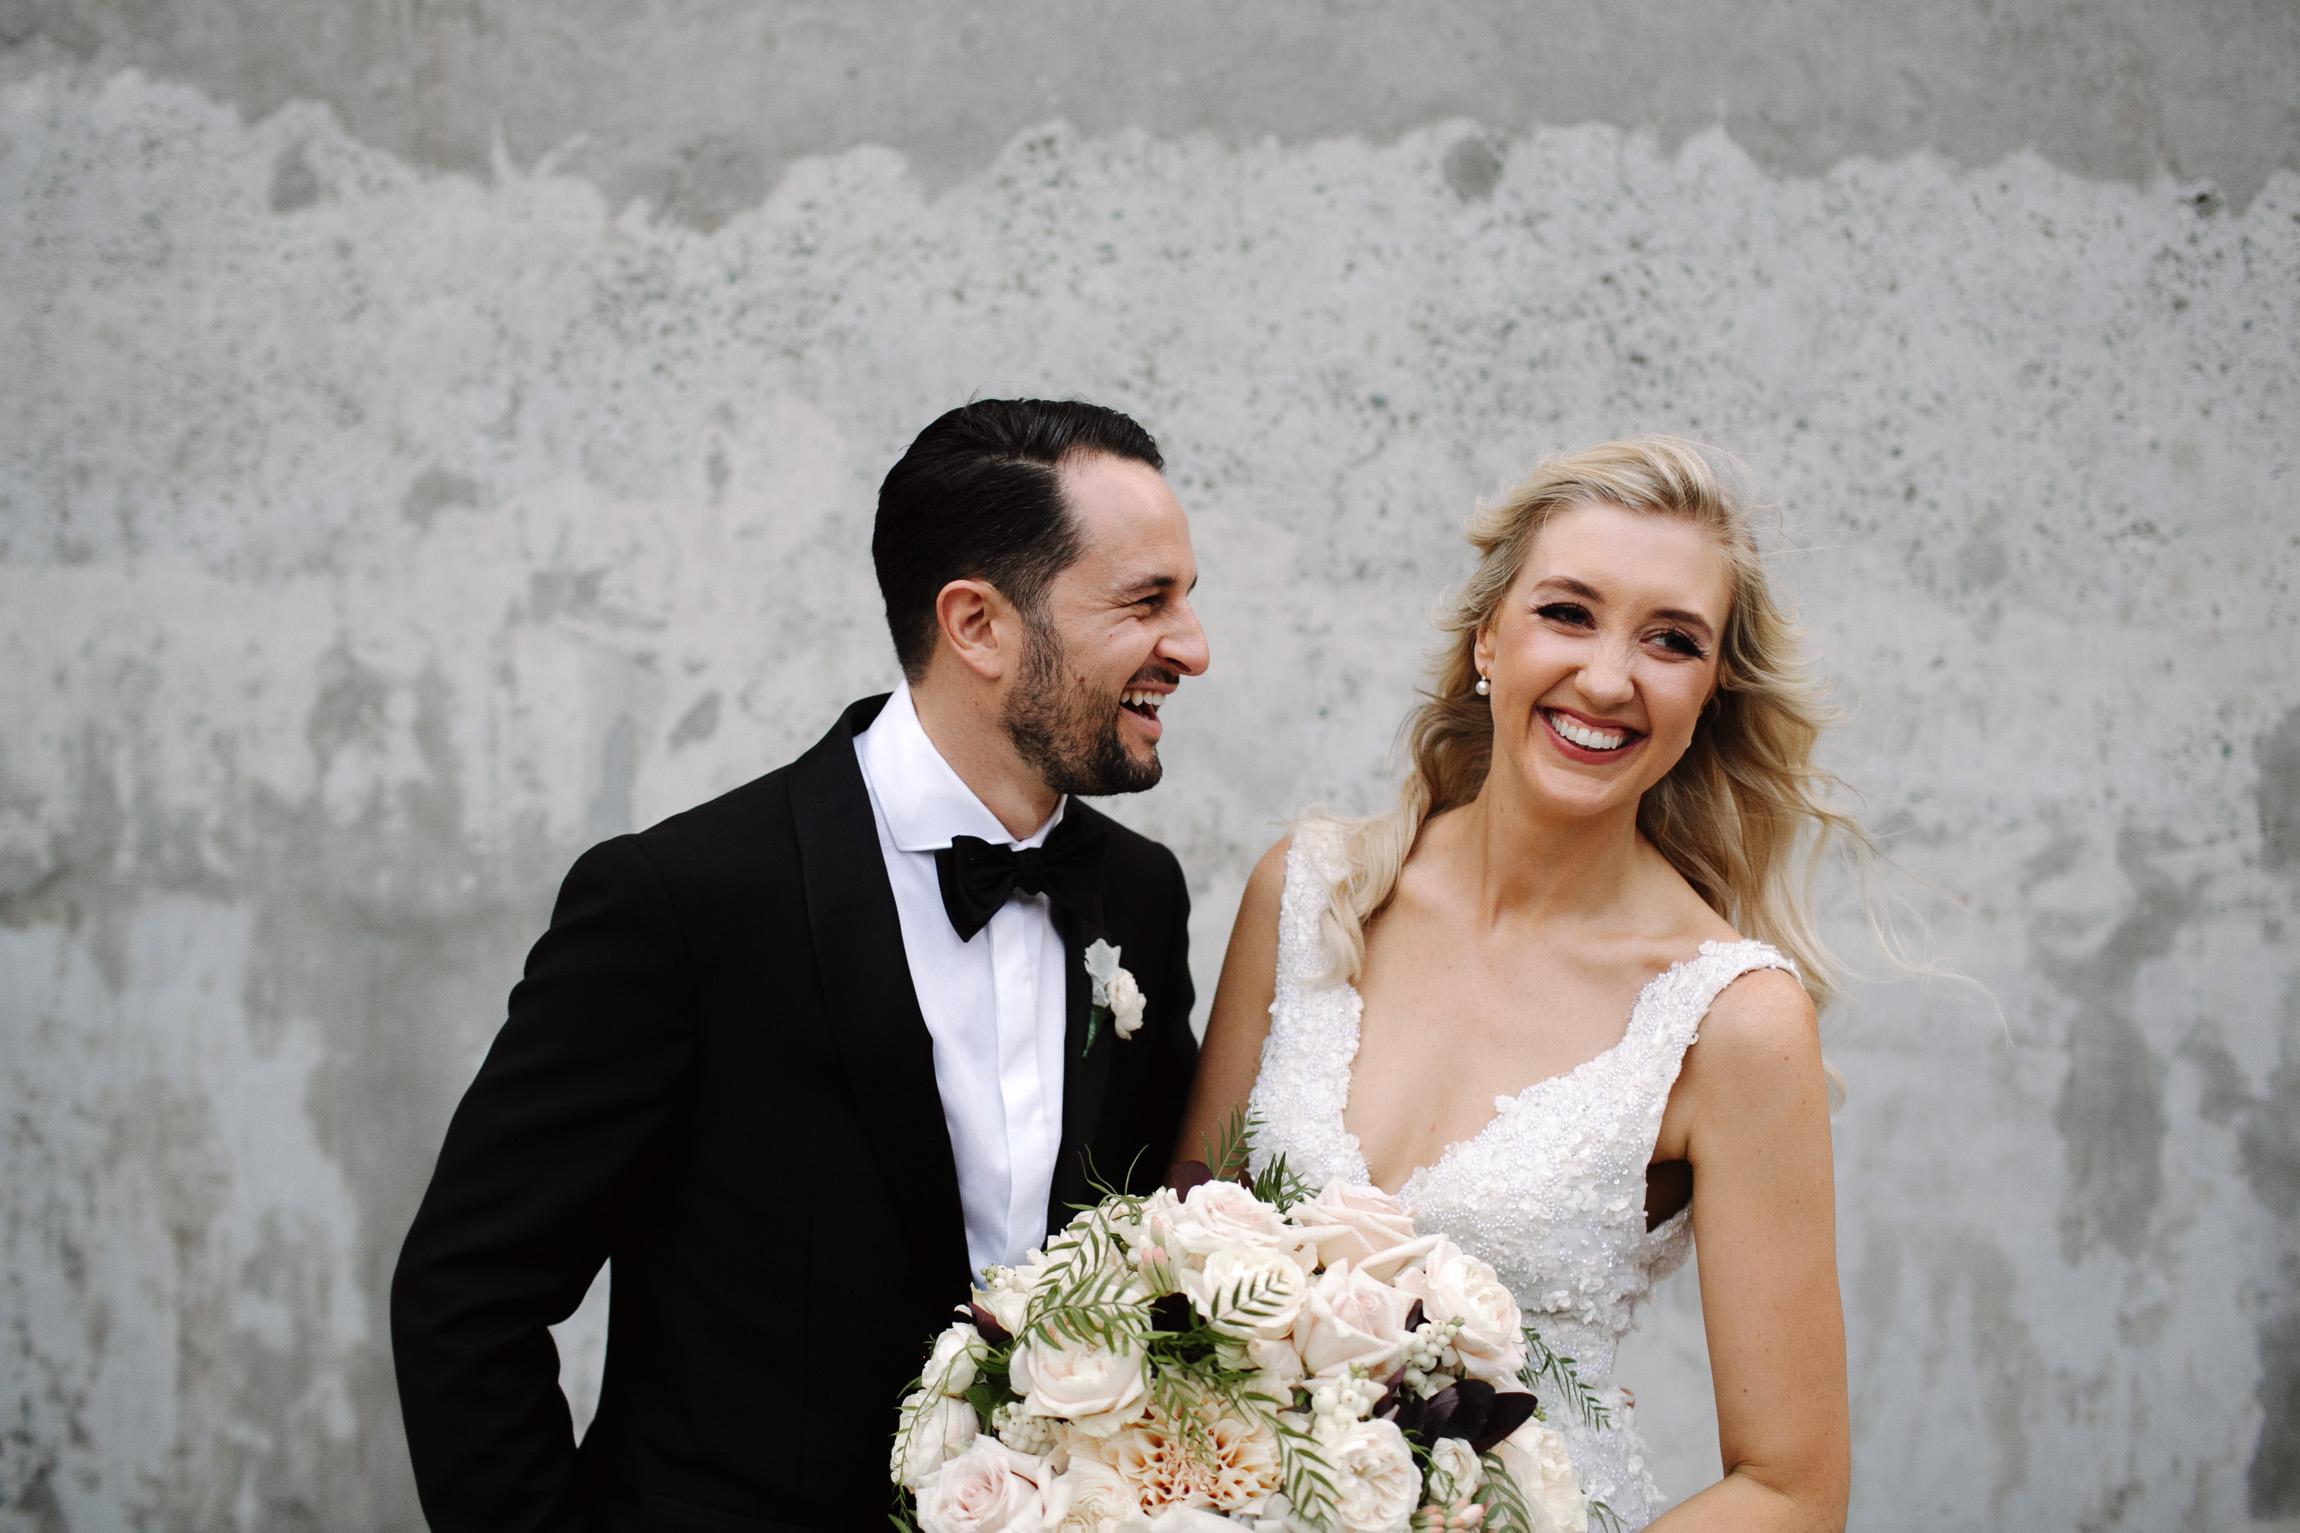 180223_justinaaron_wedding_charlotte_david_h-198.jpg